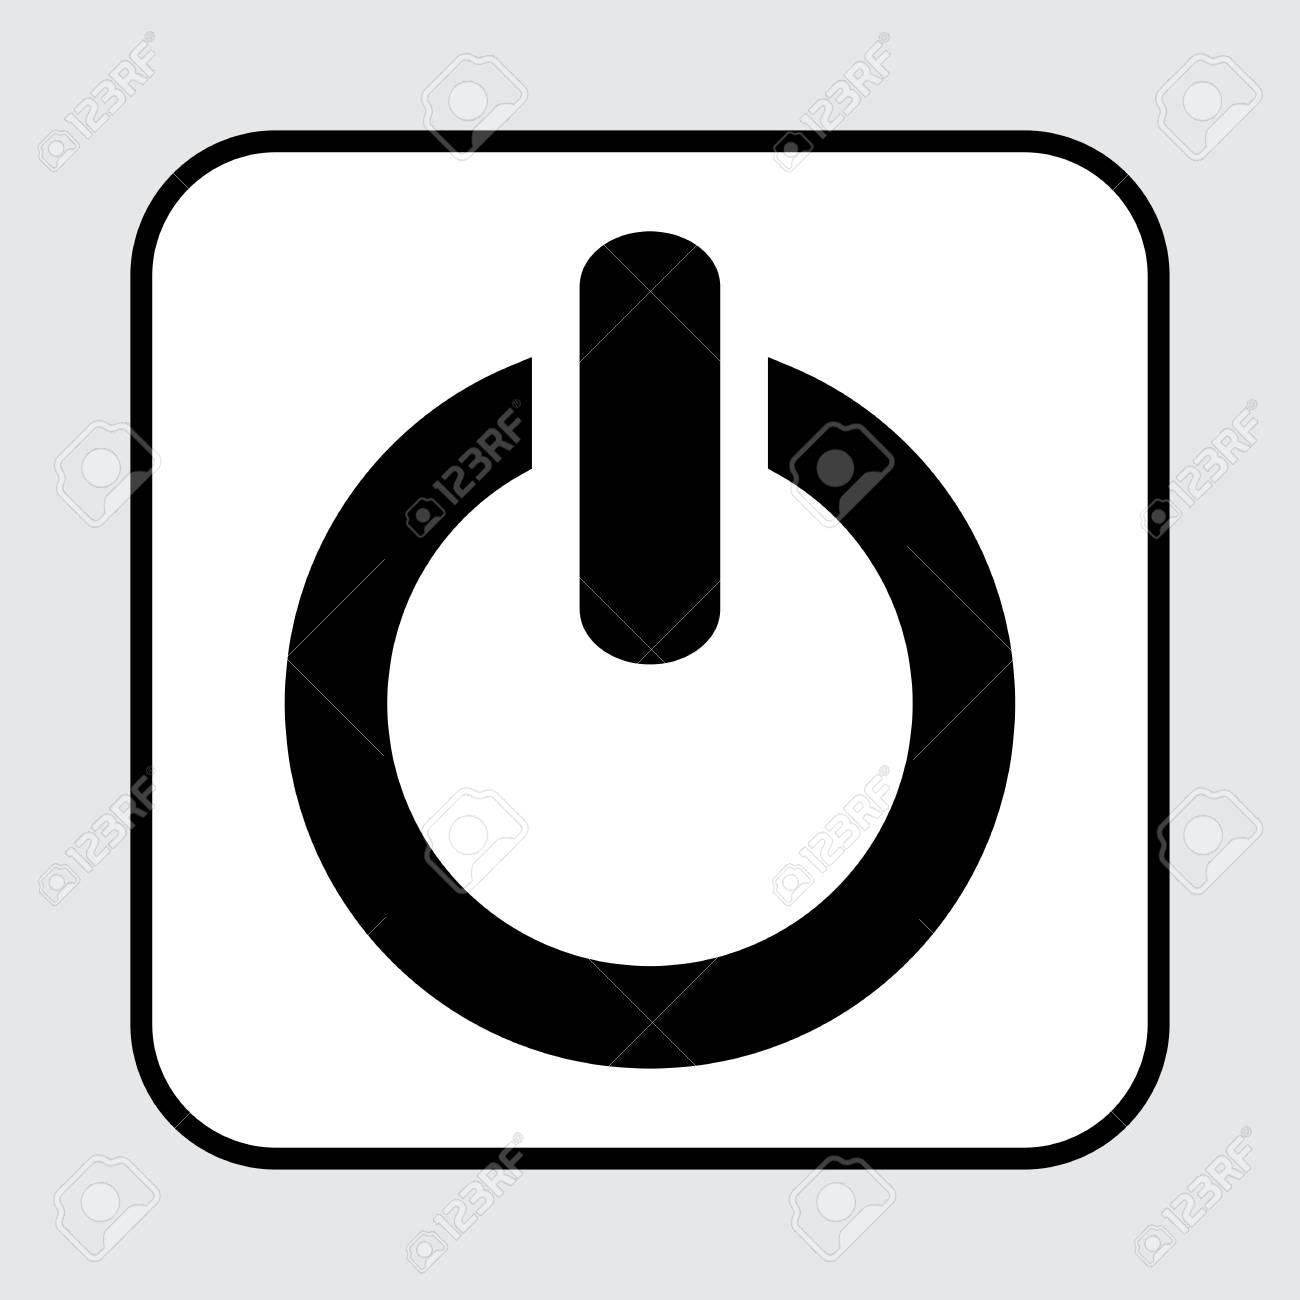 black power button icon vector illustration rh 123rf com power button vector free power button vector free